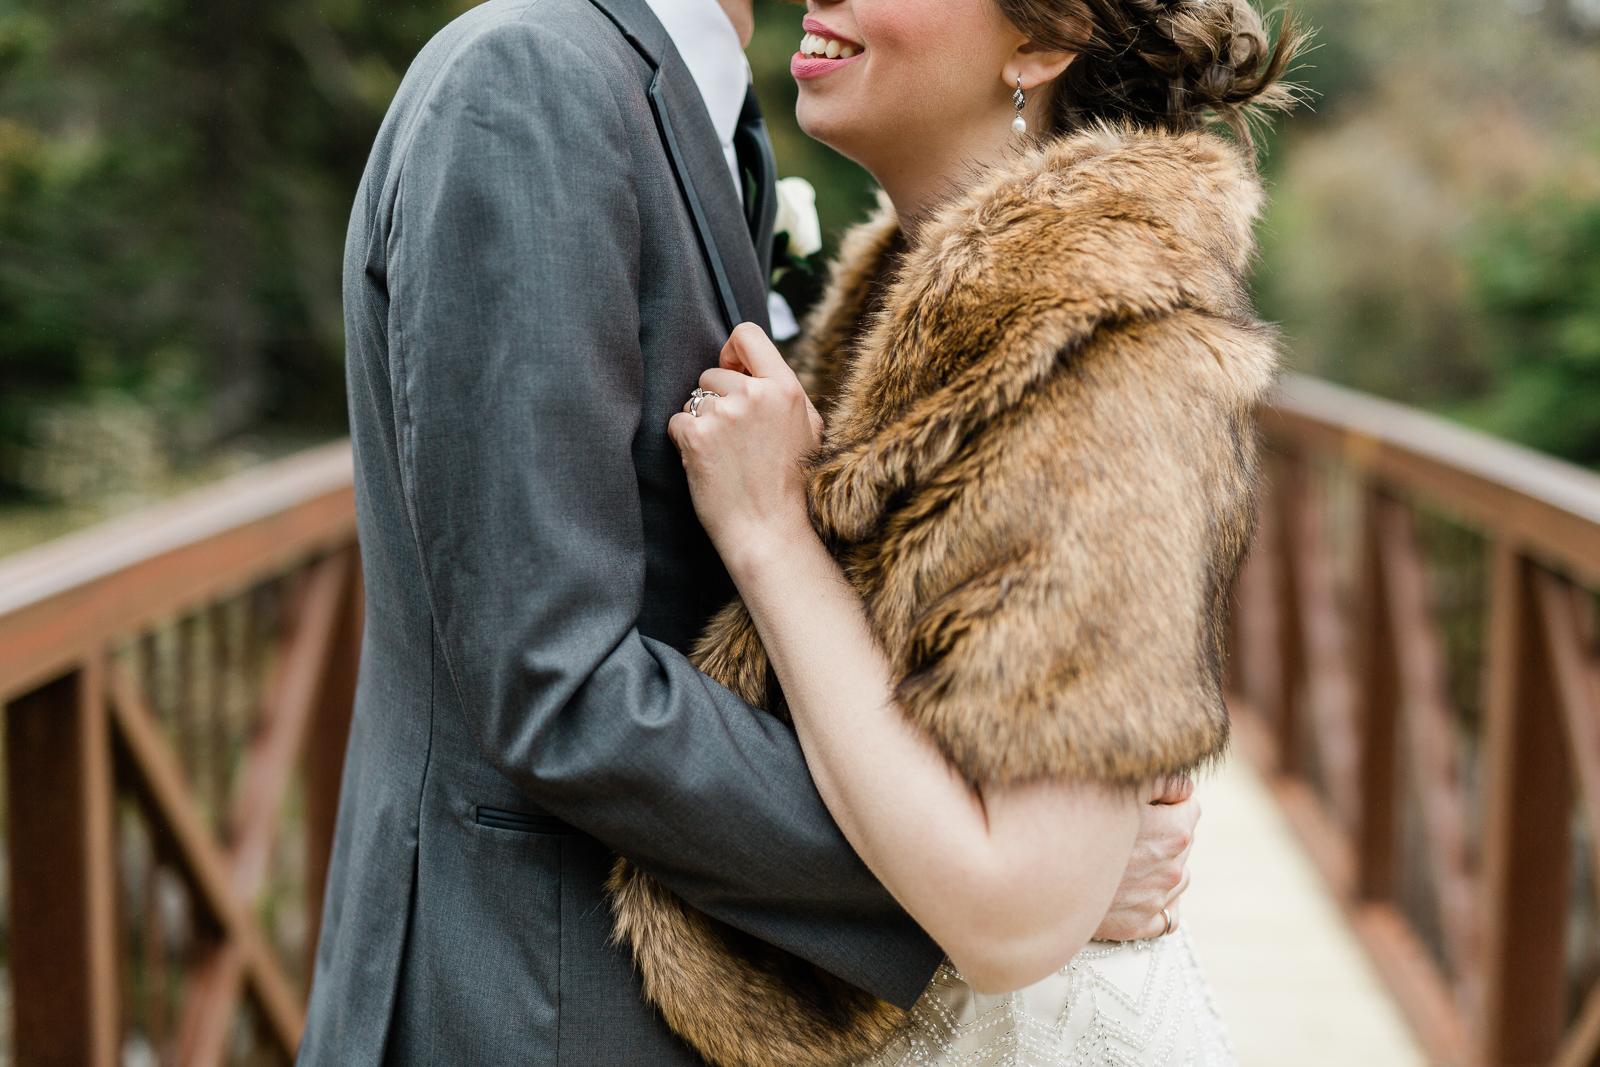 0098manuels-river-st-johns-wedding-photographer.jpg